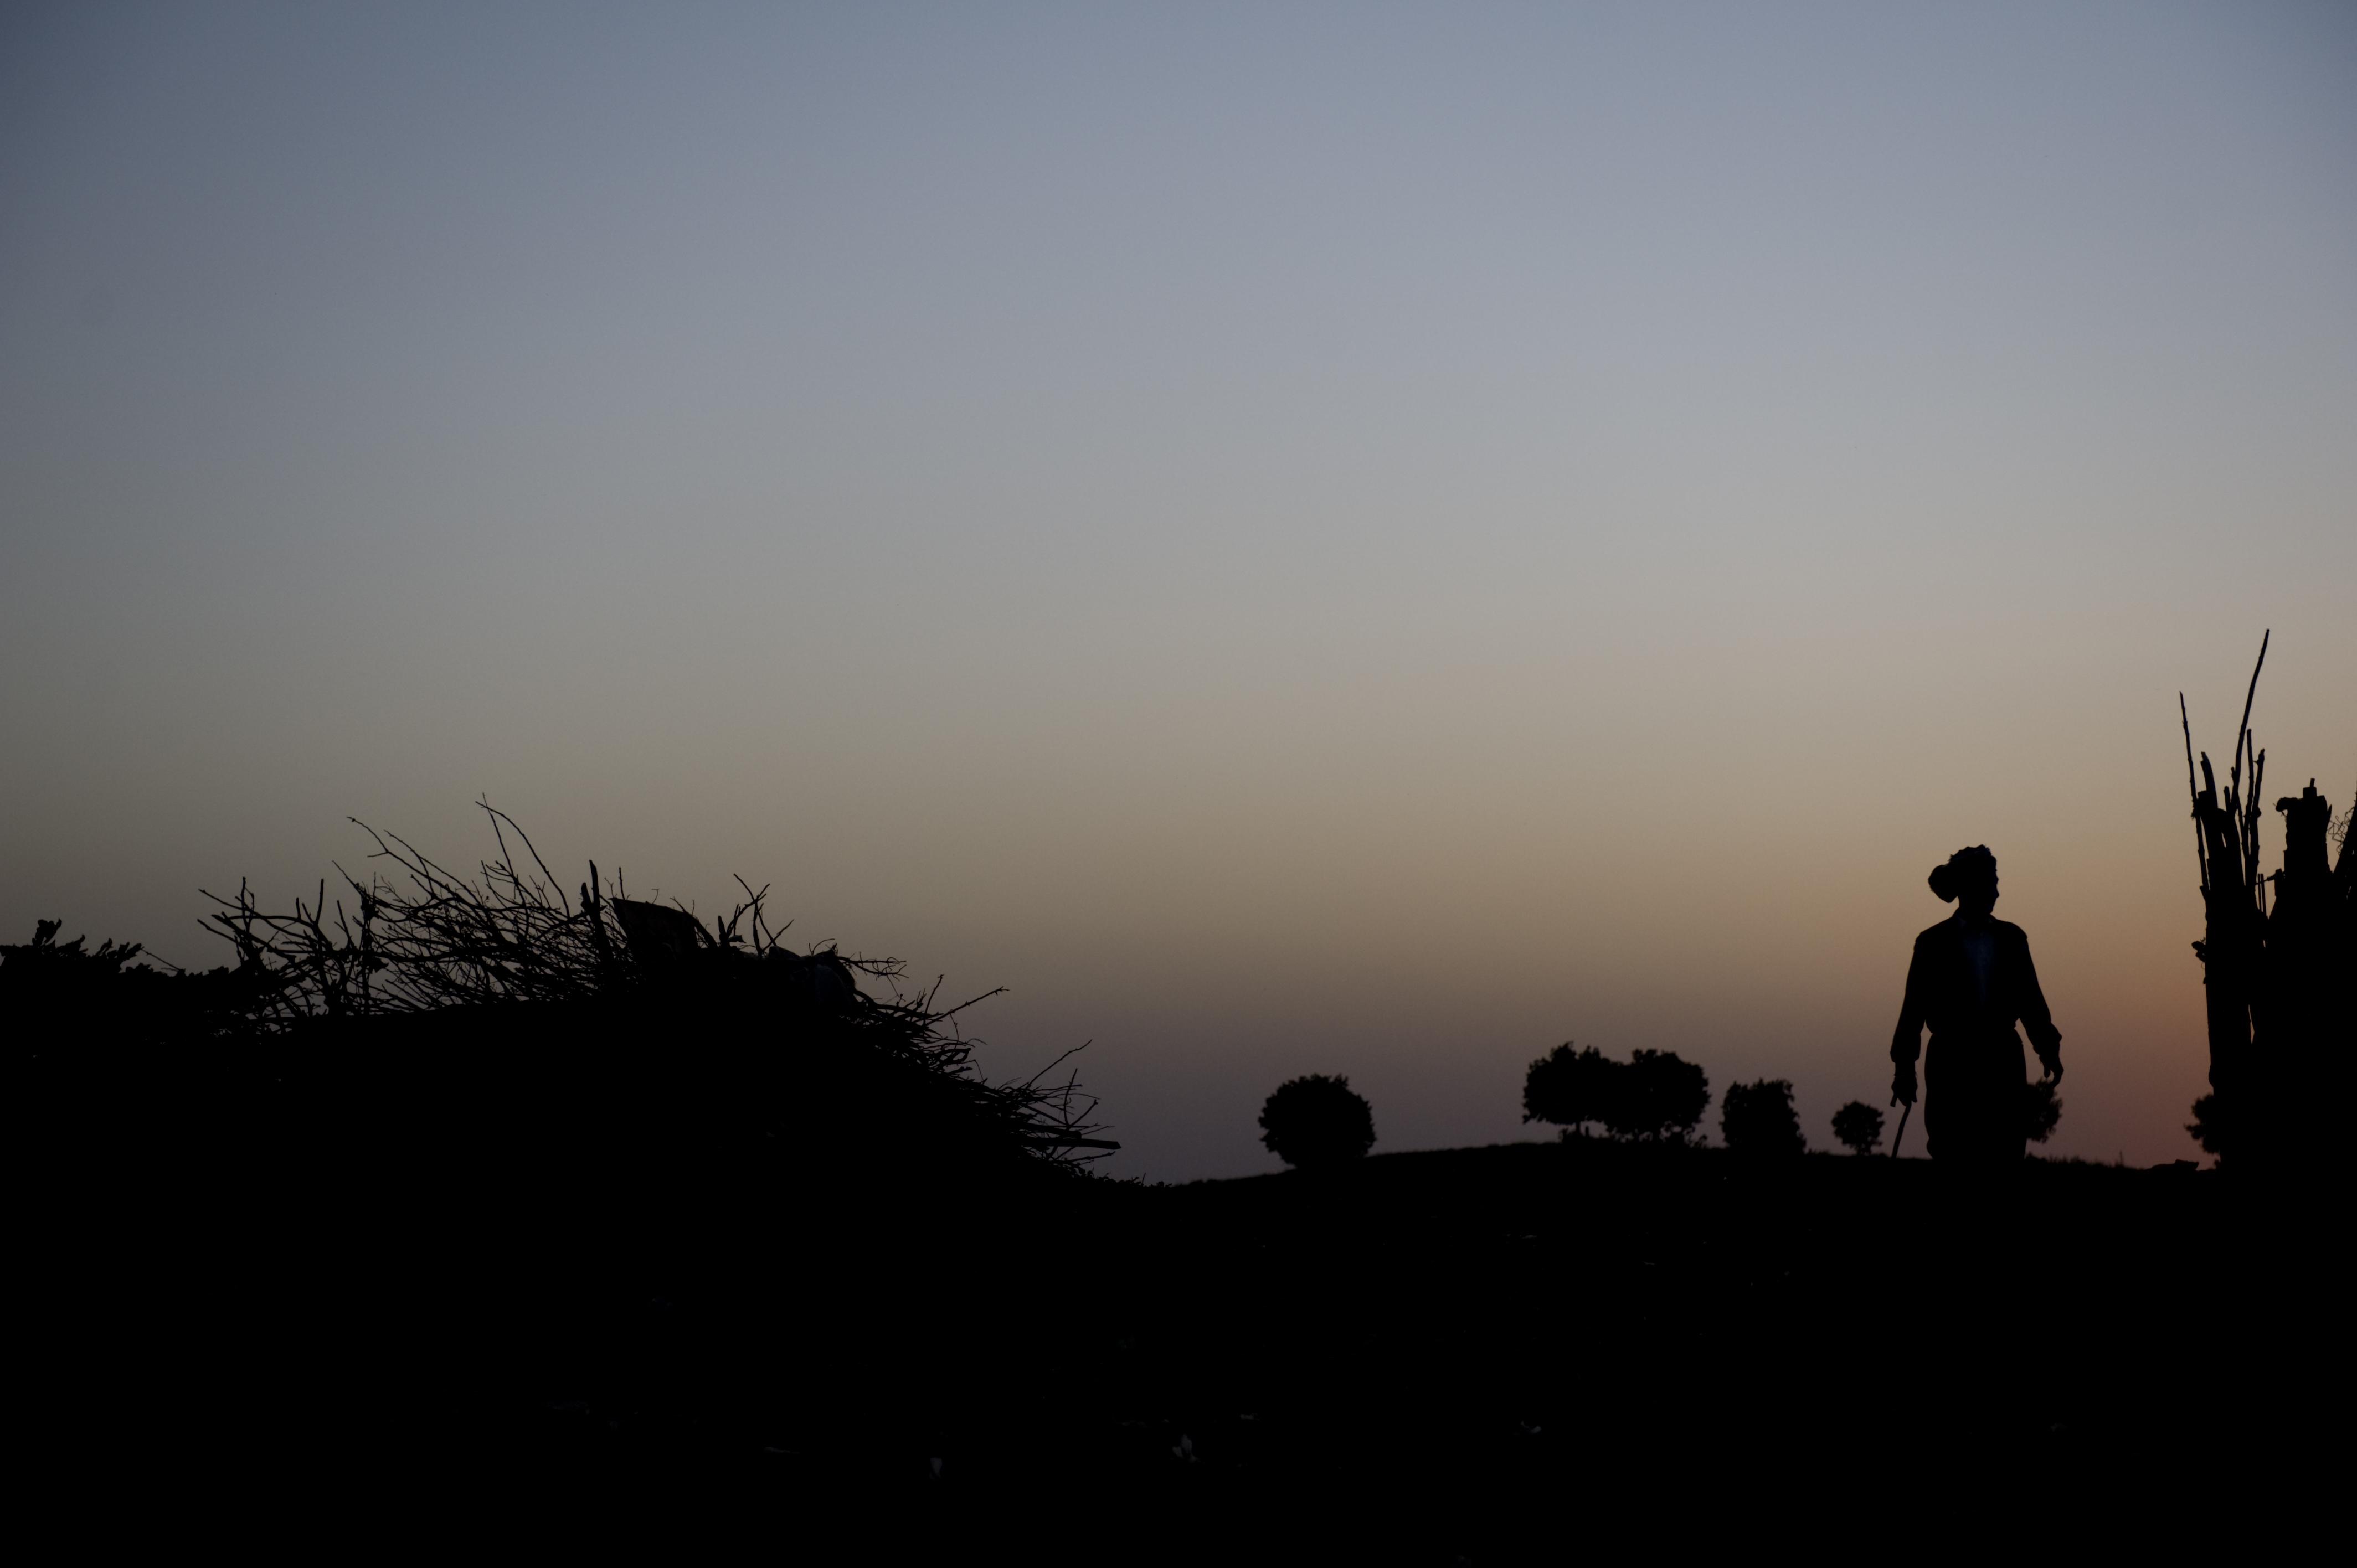 RURAL LIFE IN KUREME, NORTHERN IRAQ